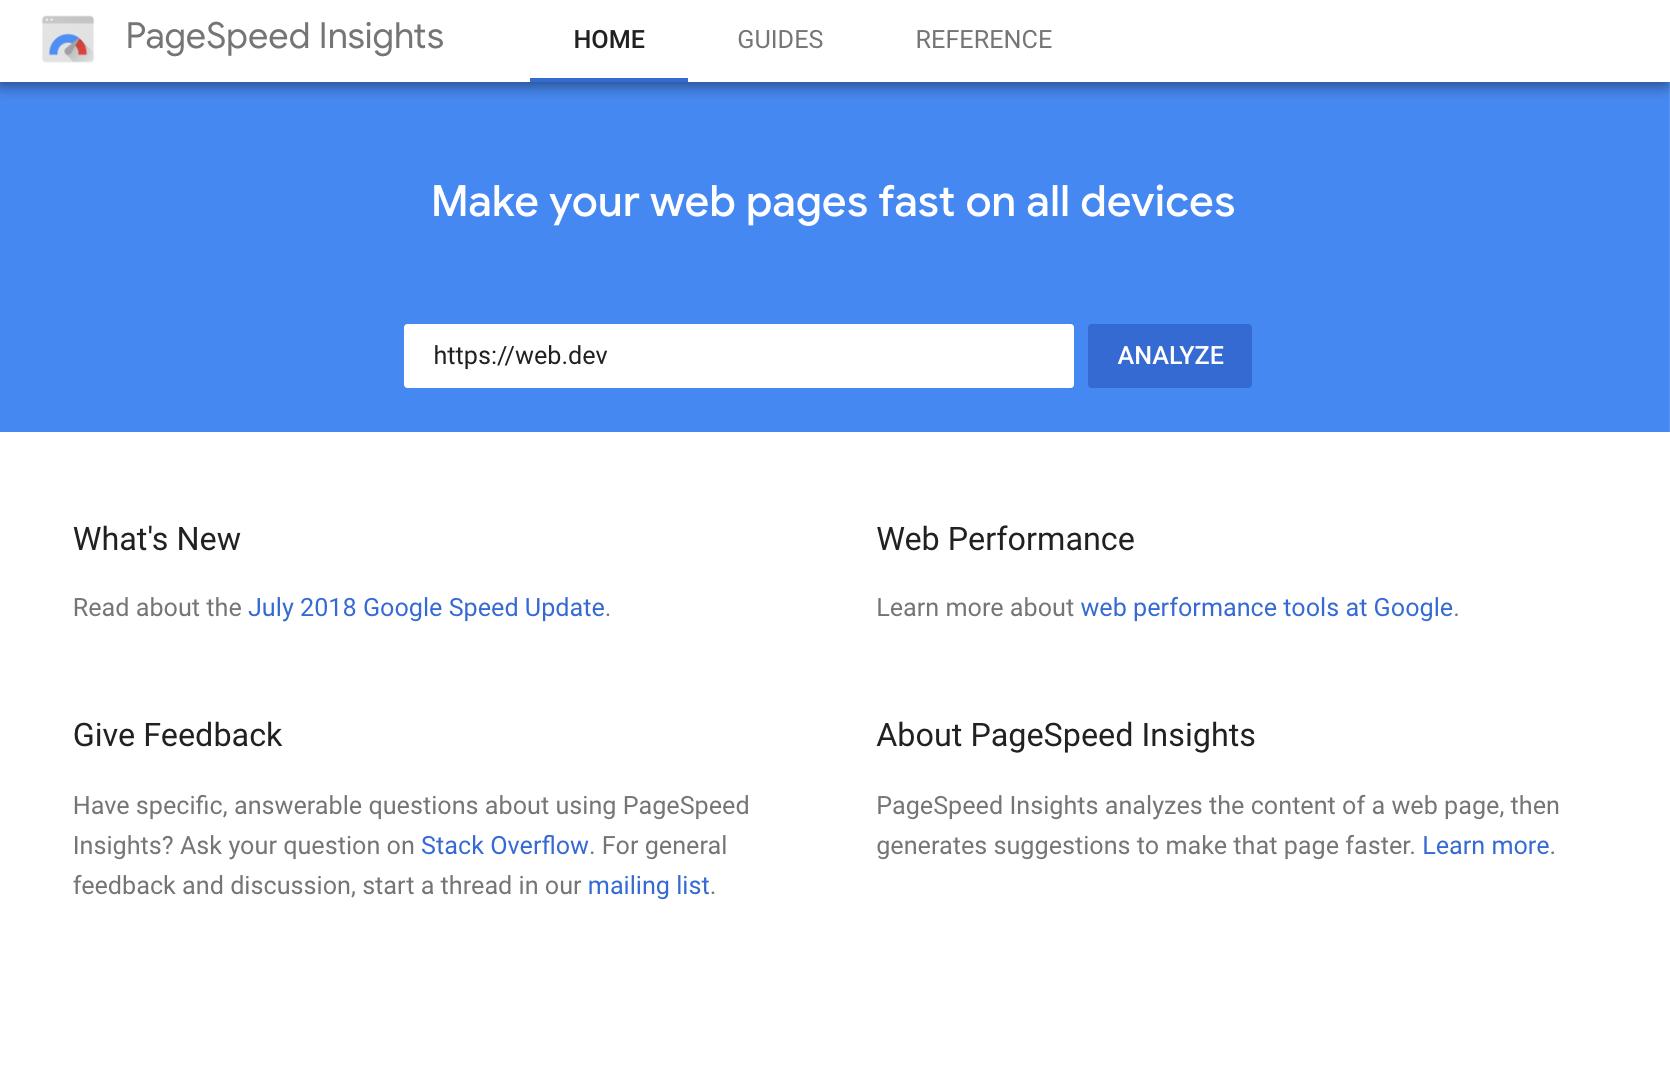 La UI de PageSpeed Insights.